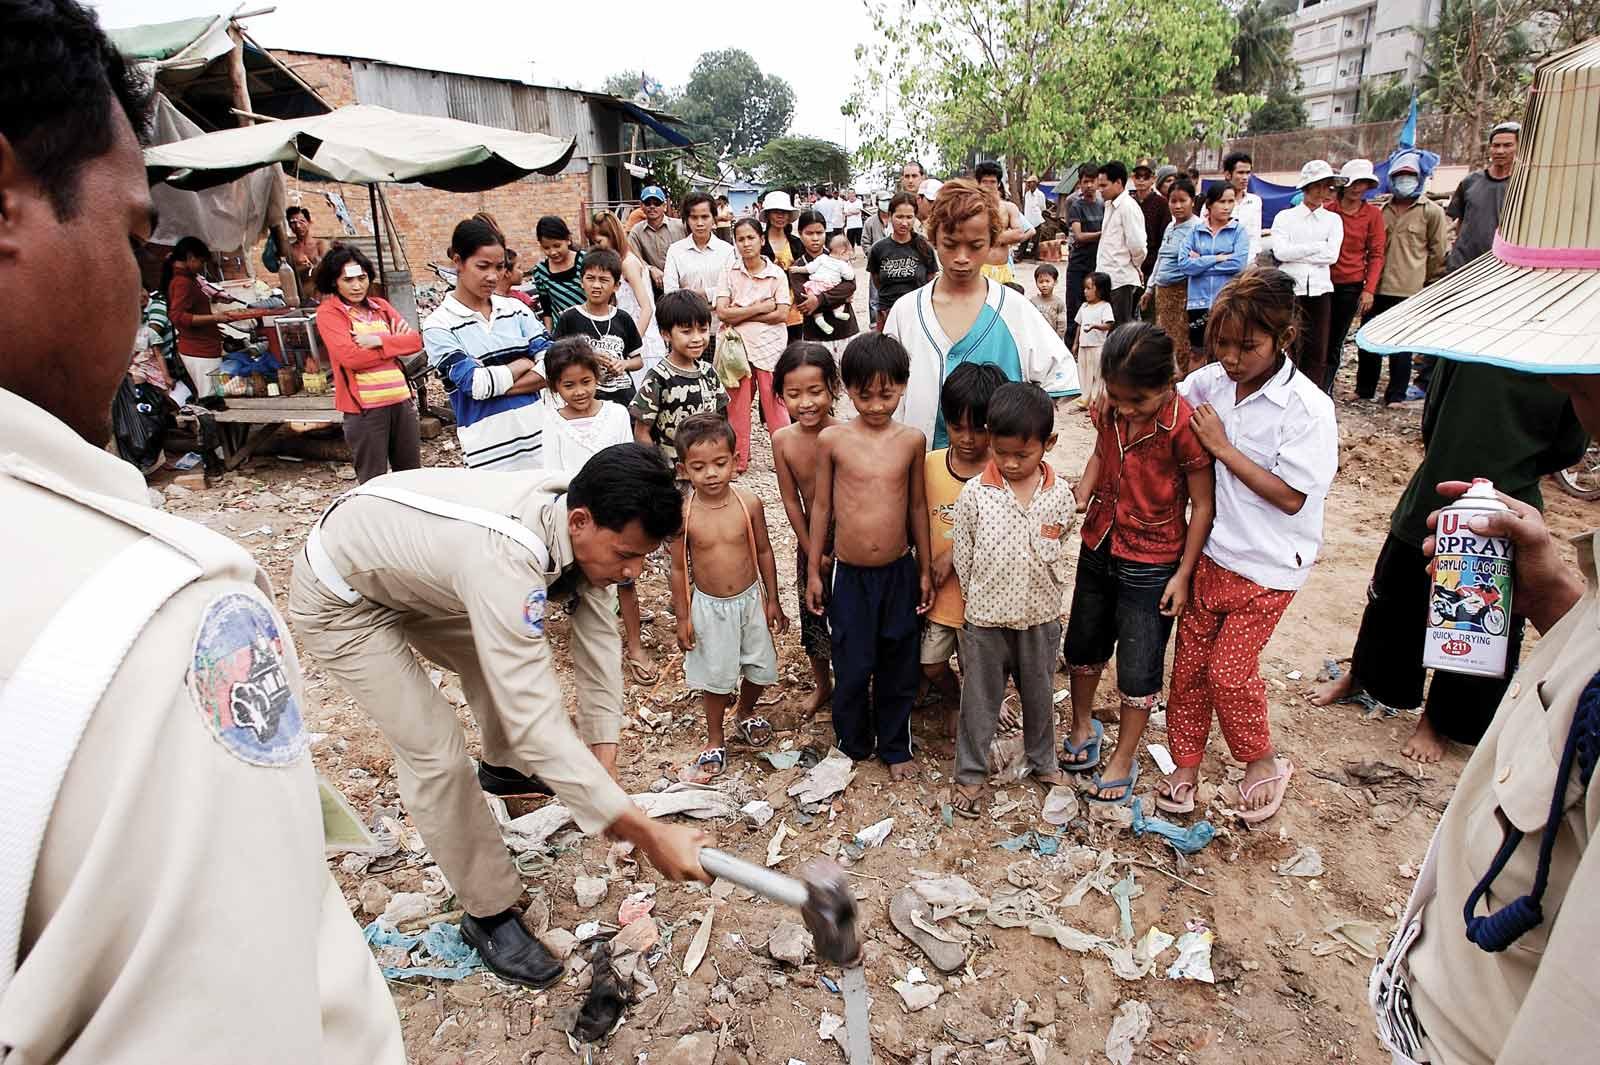 How Cambodia sold off Sihanoukville - Southeast Asia Globe